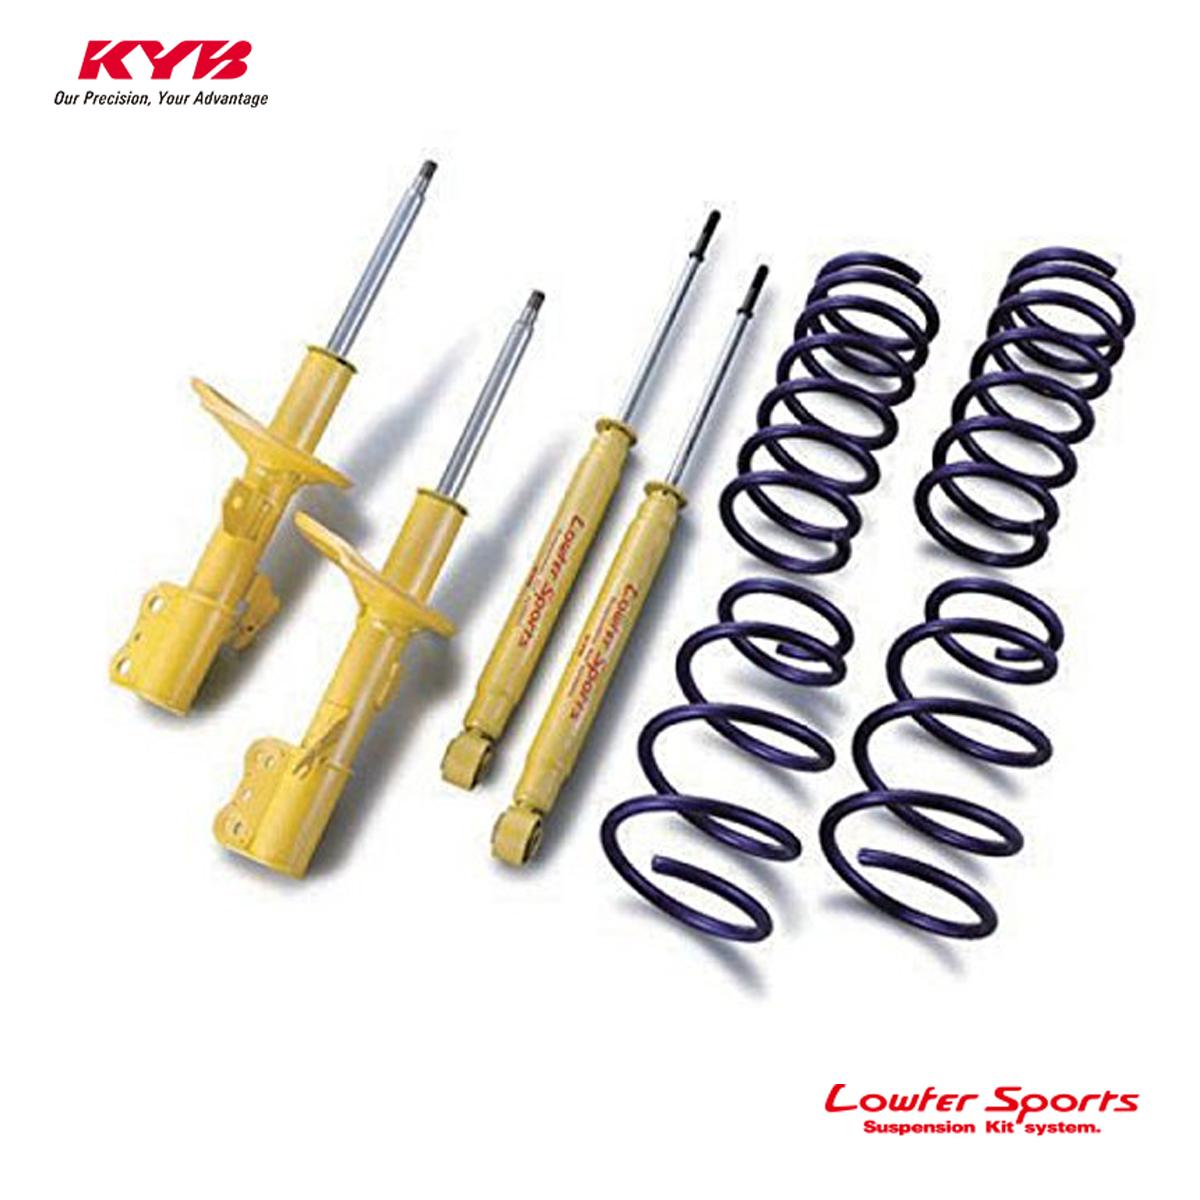 KYB カヤバ ティーダ C11 ショックアブソーバー サスペンションキット Lowfer Sports LKIT-C11 配送先条件有り